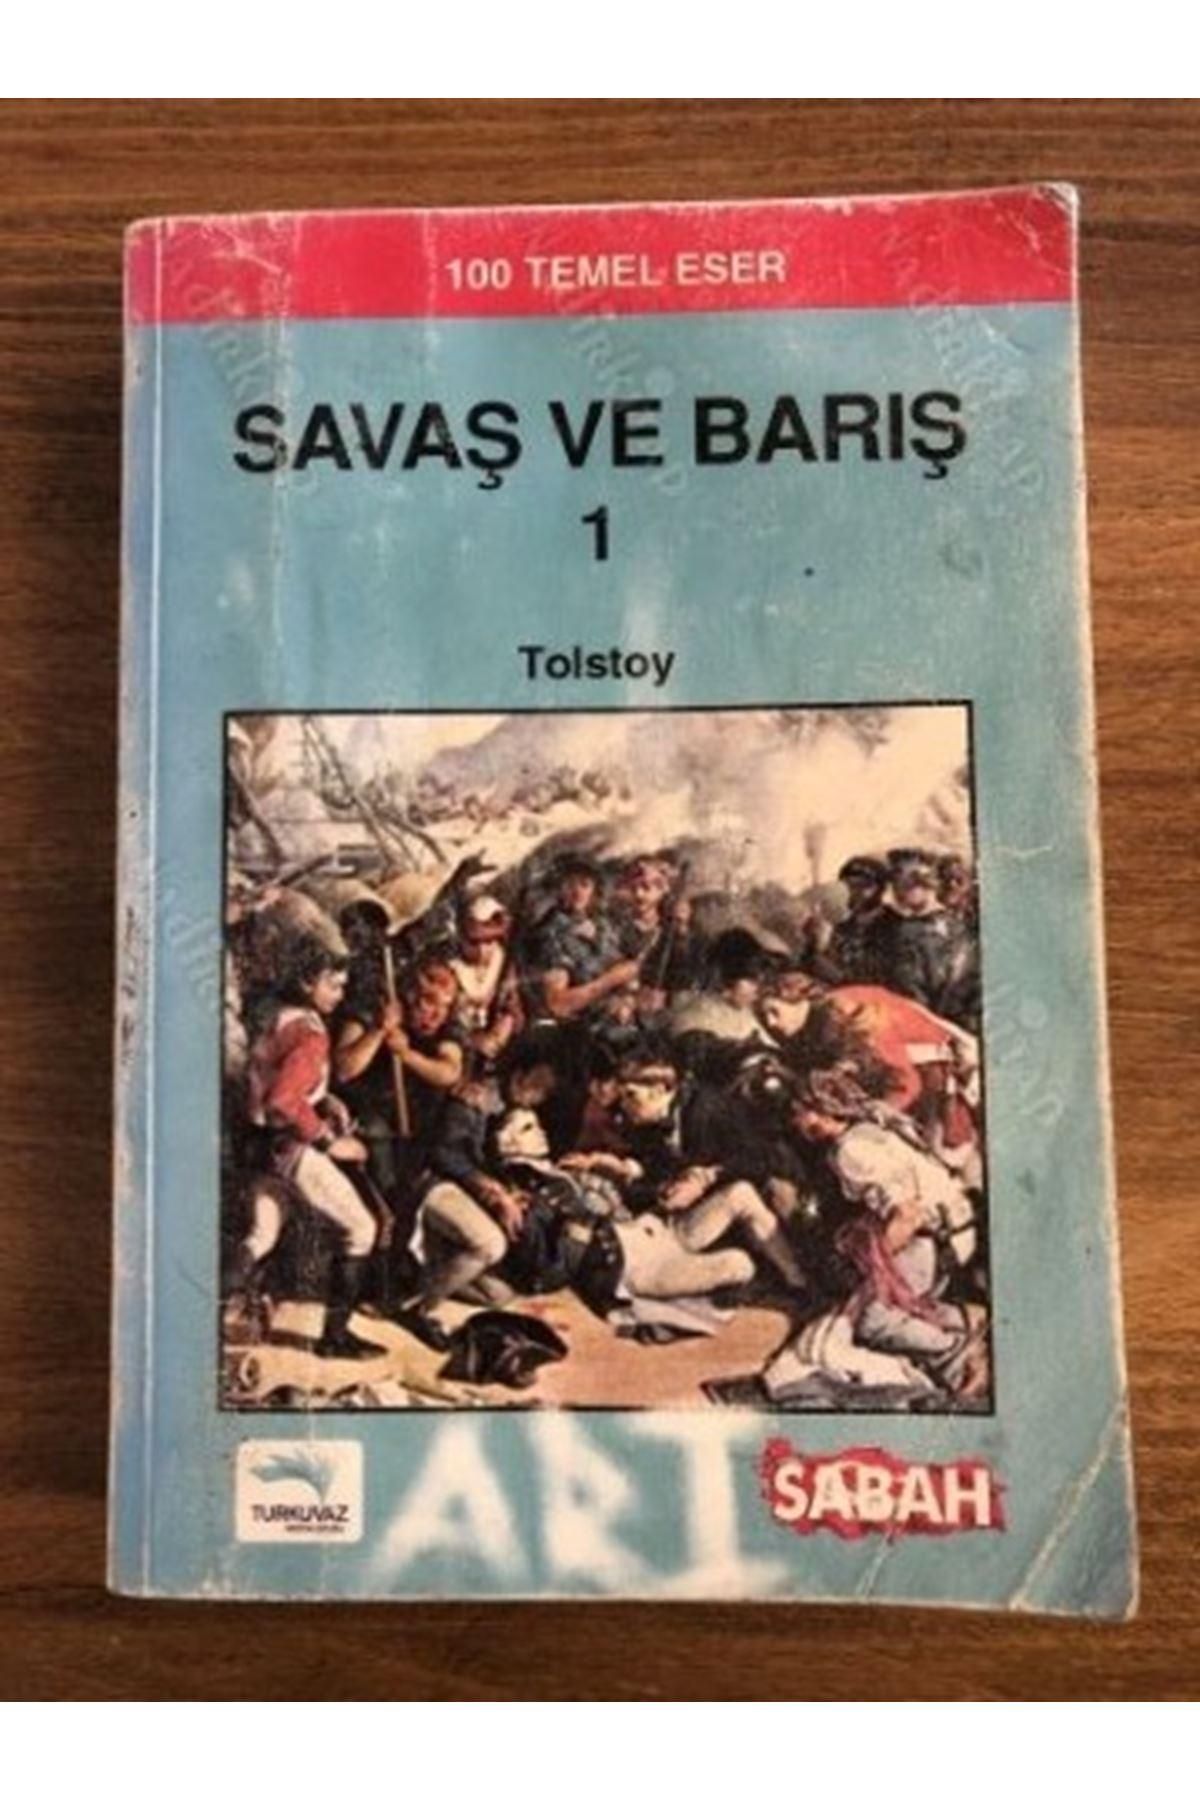 TOLSTOY - SAVAŞ VE BARIŞ 1